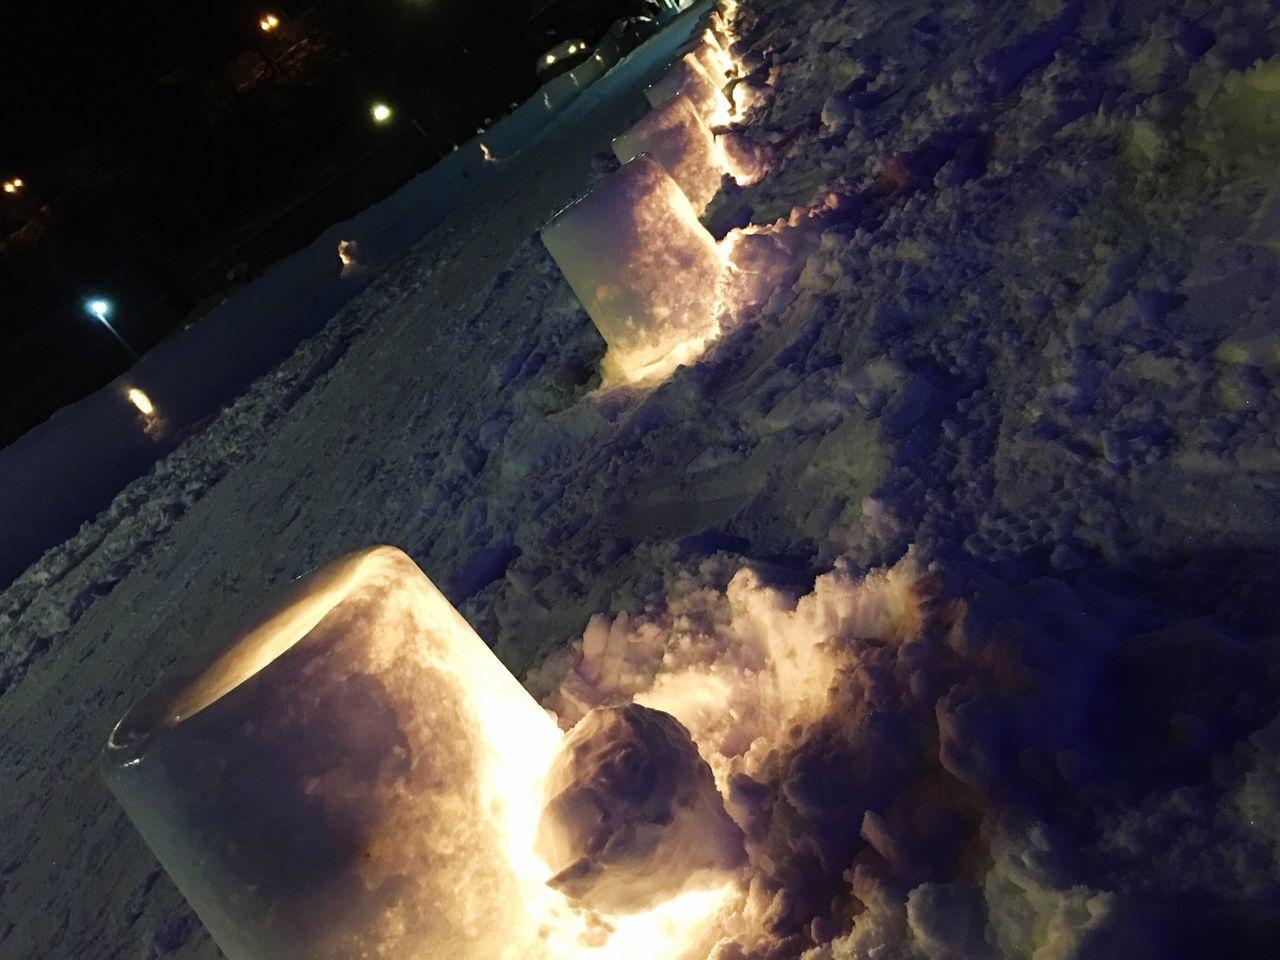 Cuture Glow Winter Japan Snow Light Hokkaido Flame Candle Light Illuminated Snow Path Road